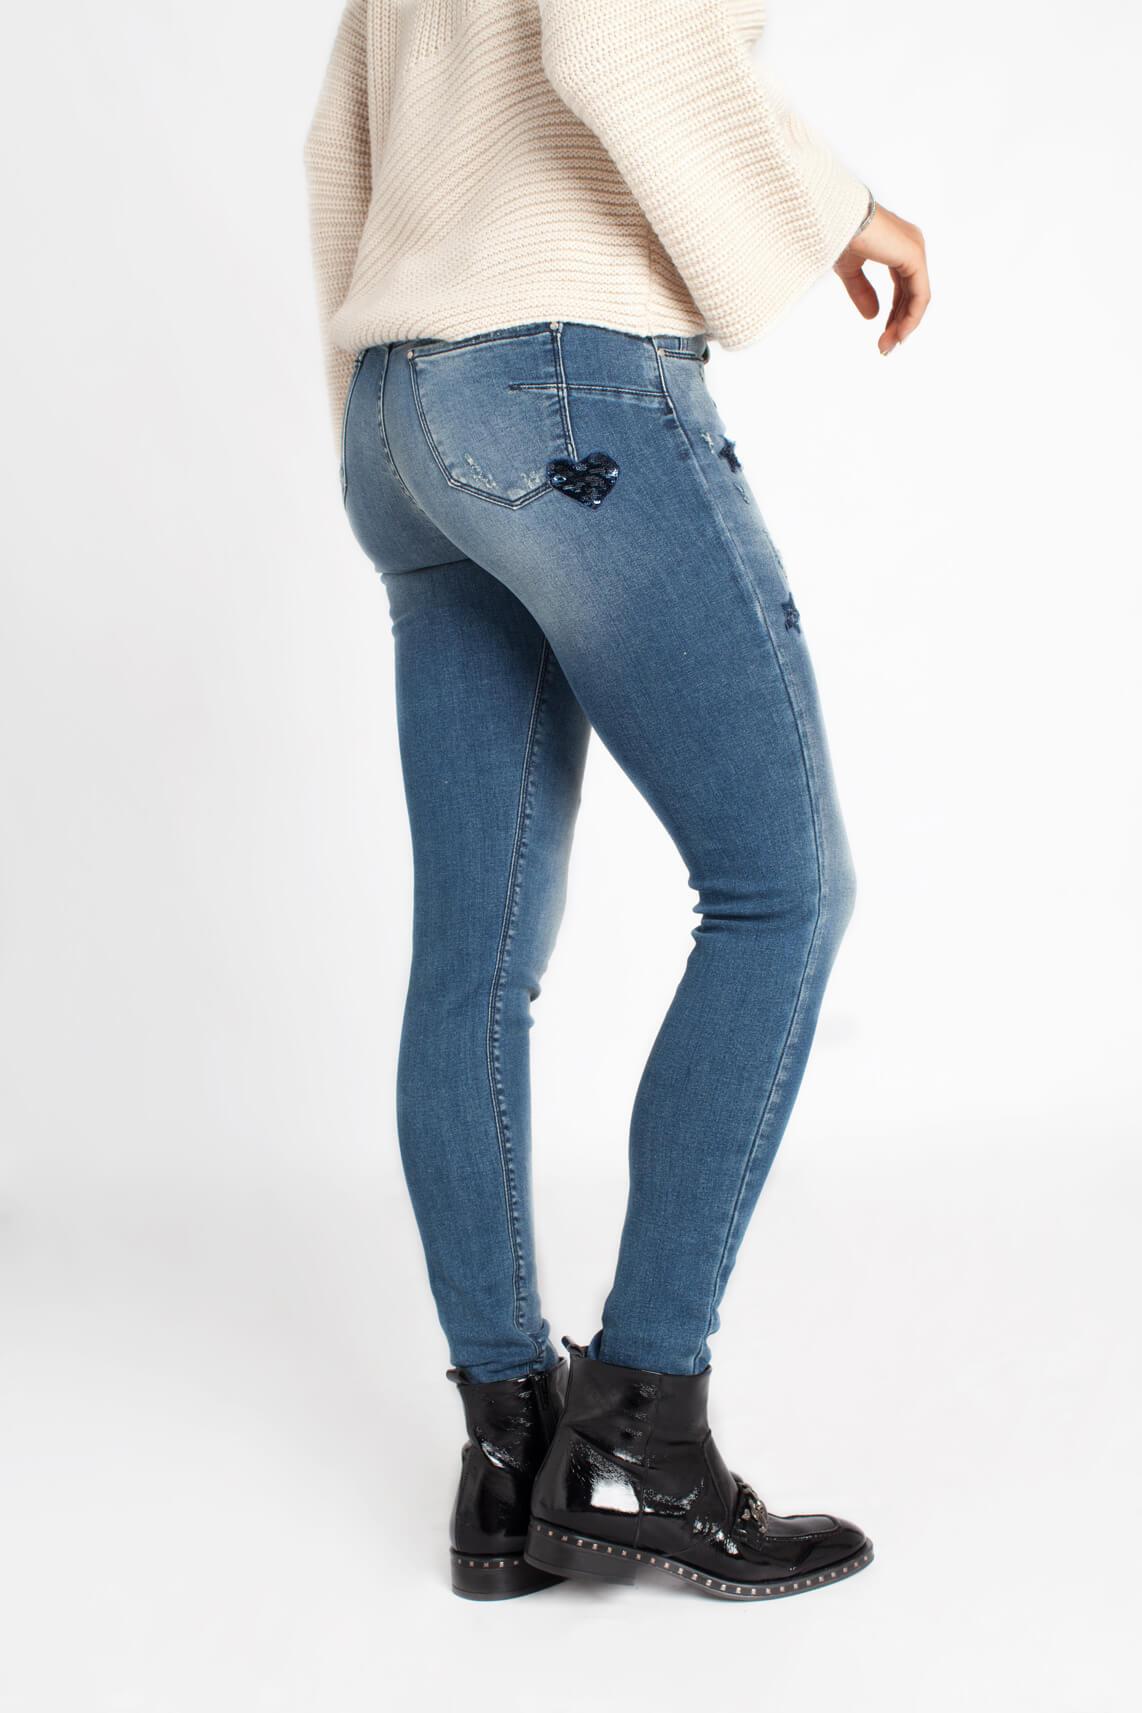 Kocca Dames Kara jeans met pailletten Blauw